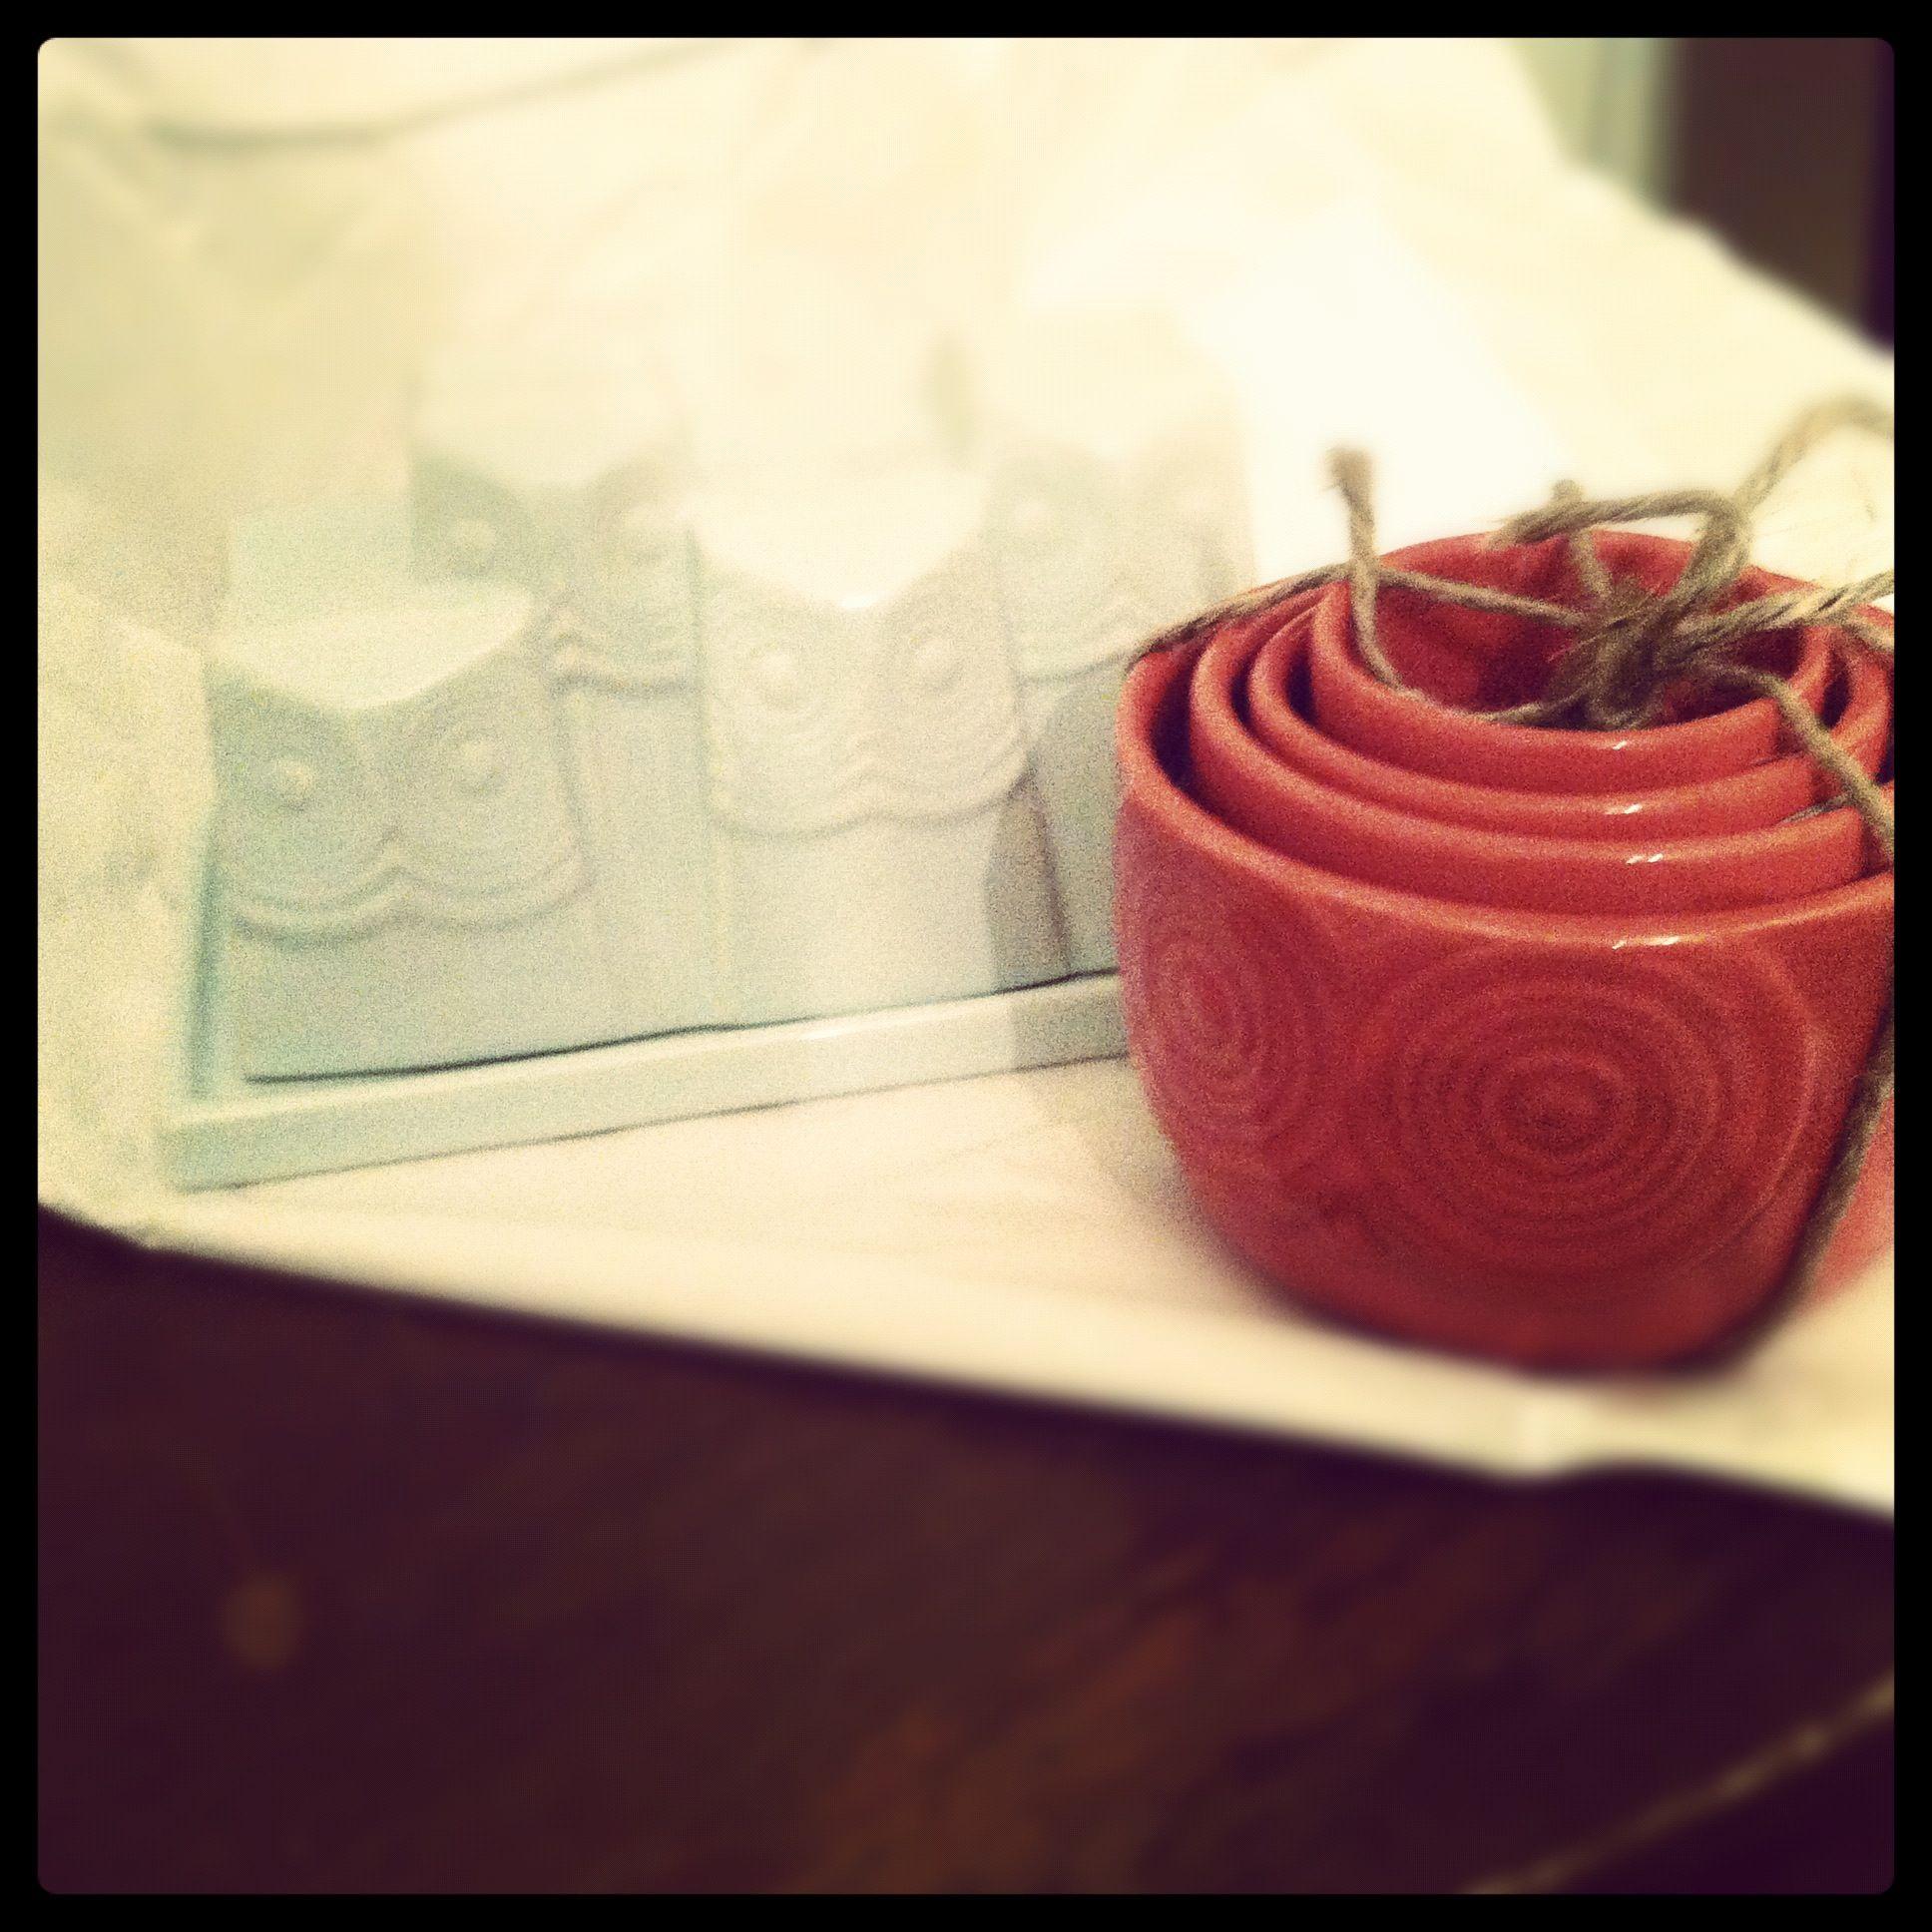 owl kitchen accessories from west elm | nesting | pinterest | owl